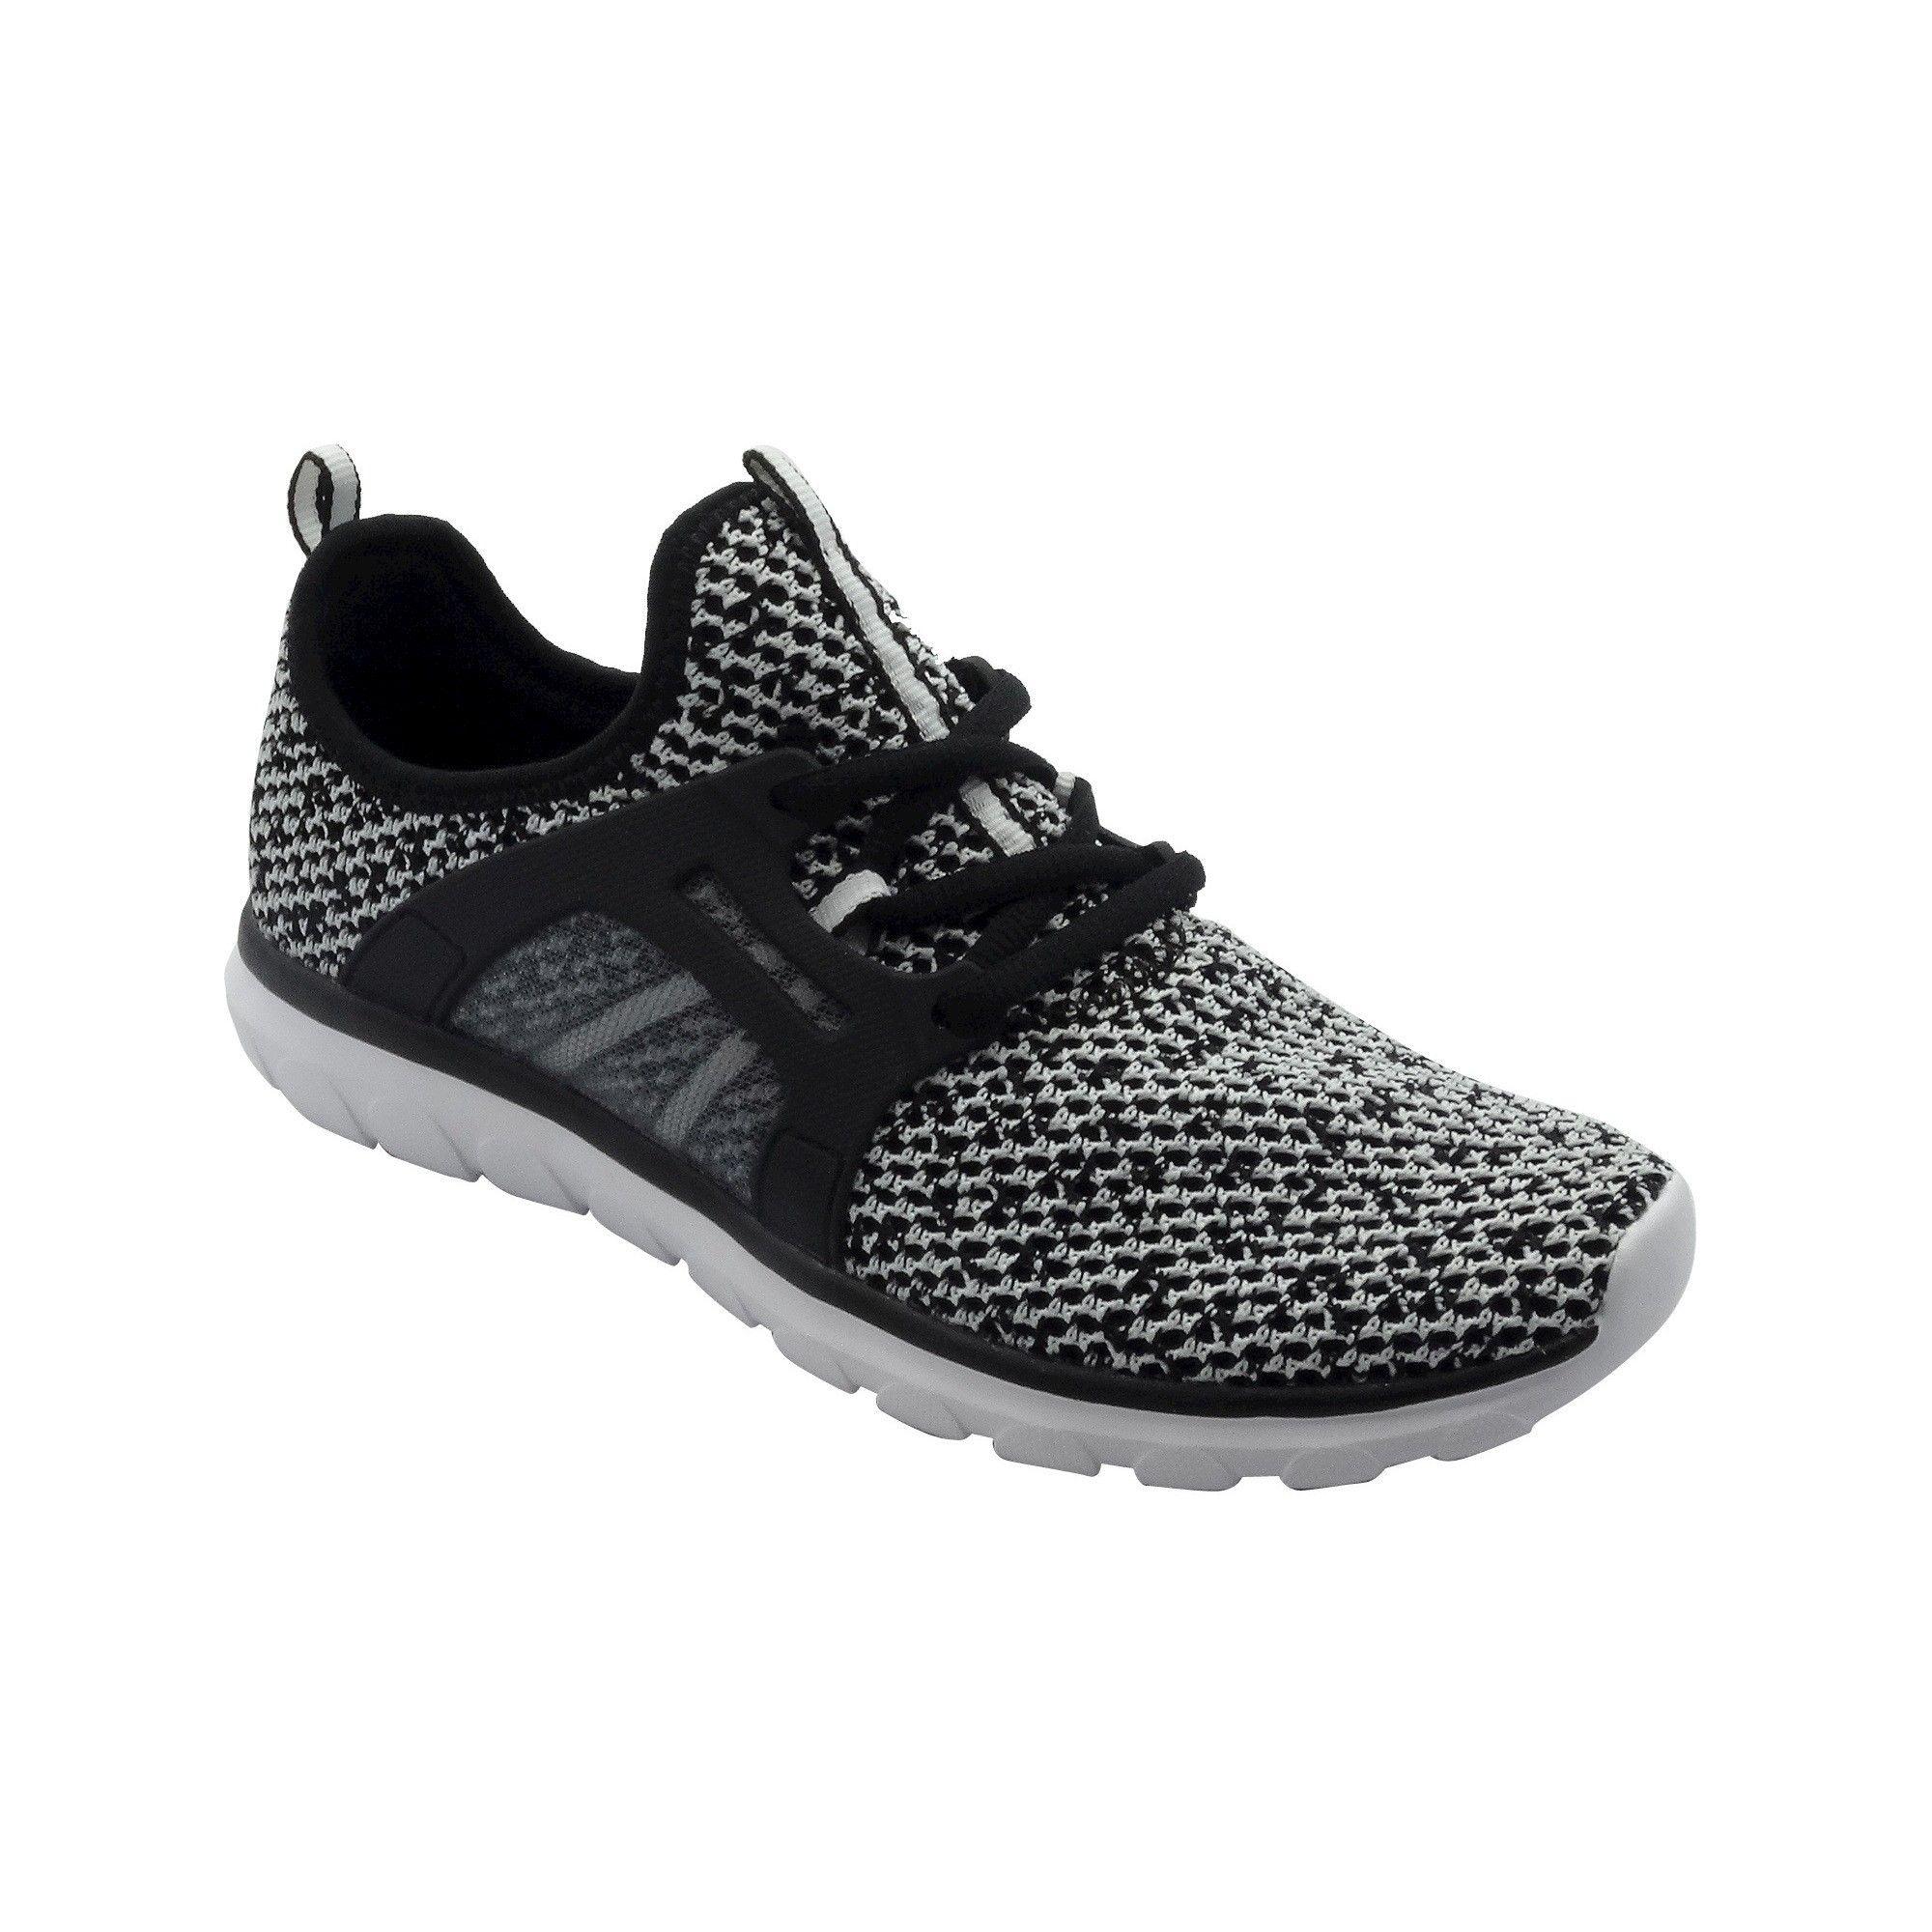 e19b066eb1b594 Women s Poise Performance Athletic Shoes - C9 Champion Black White ...